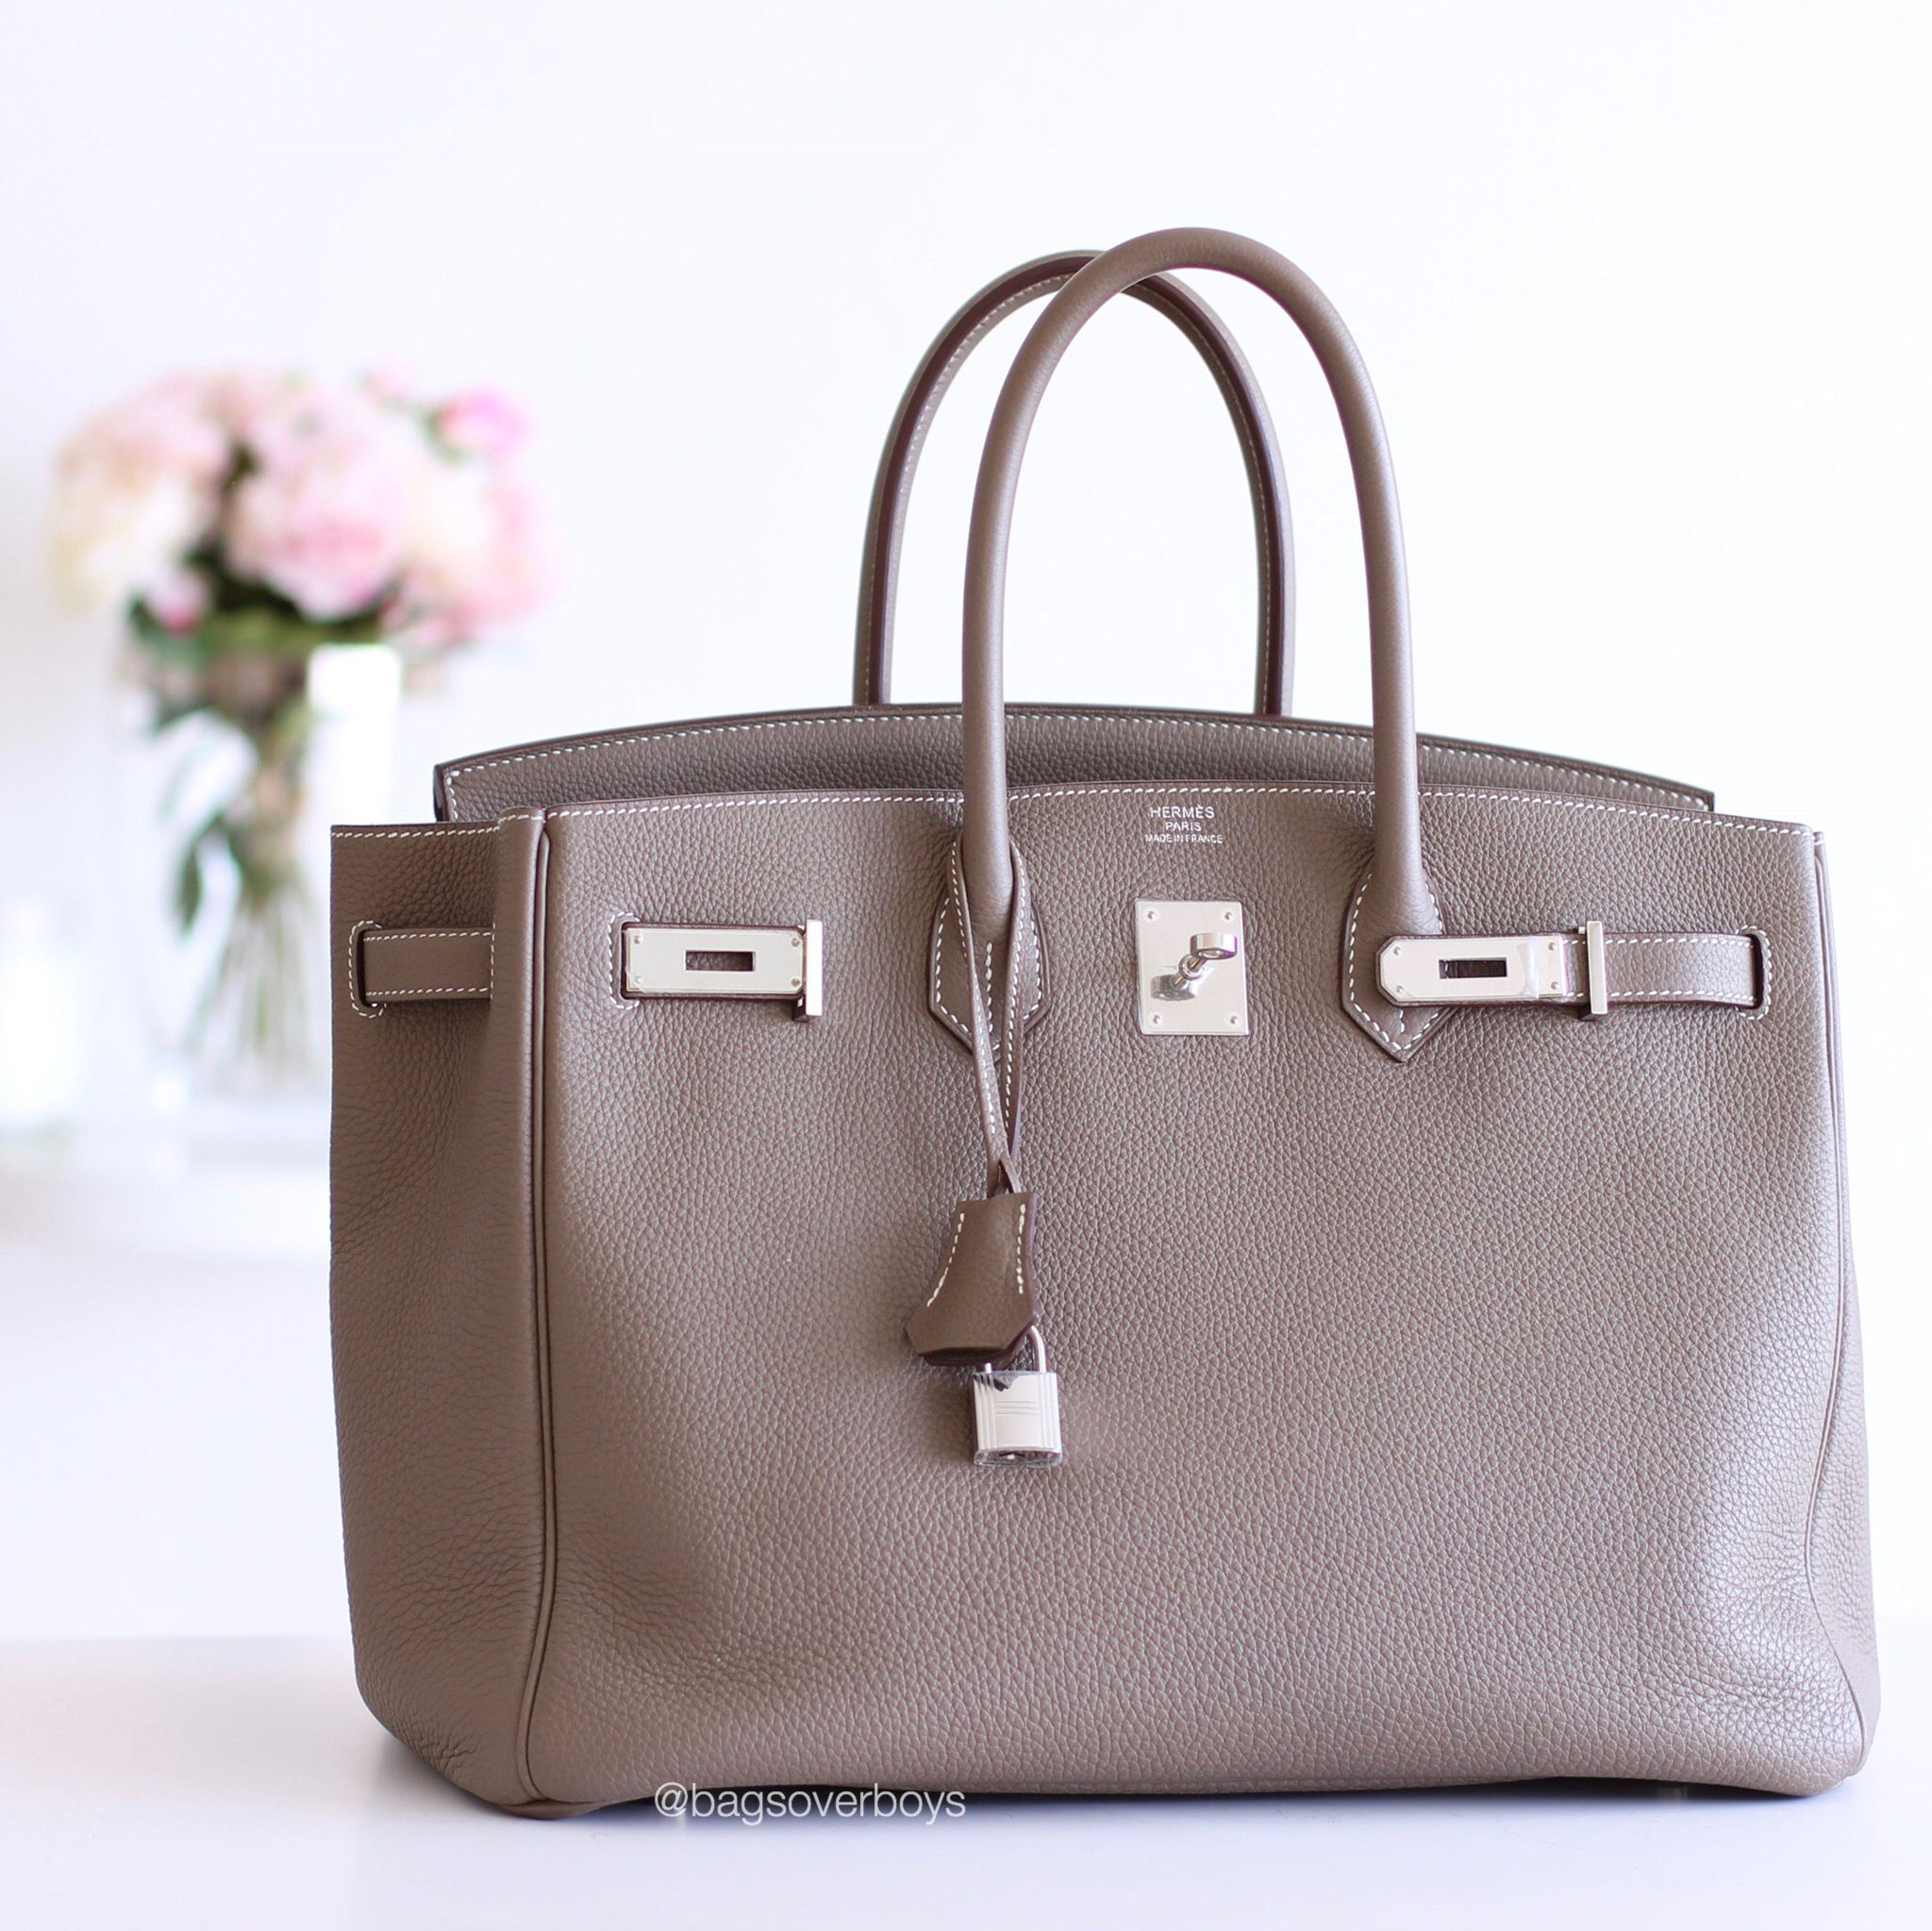 2b0a0ebb0a Hermès Birkin Bag